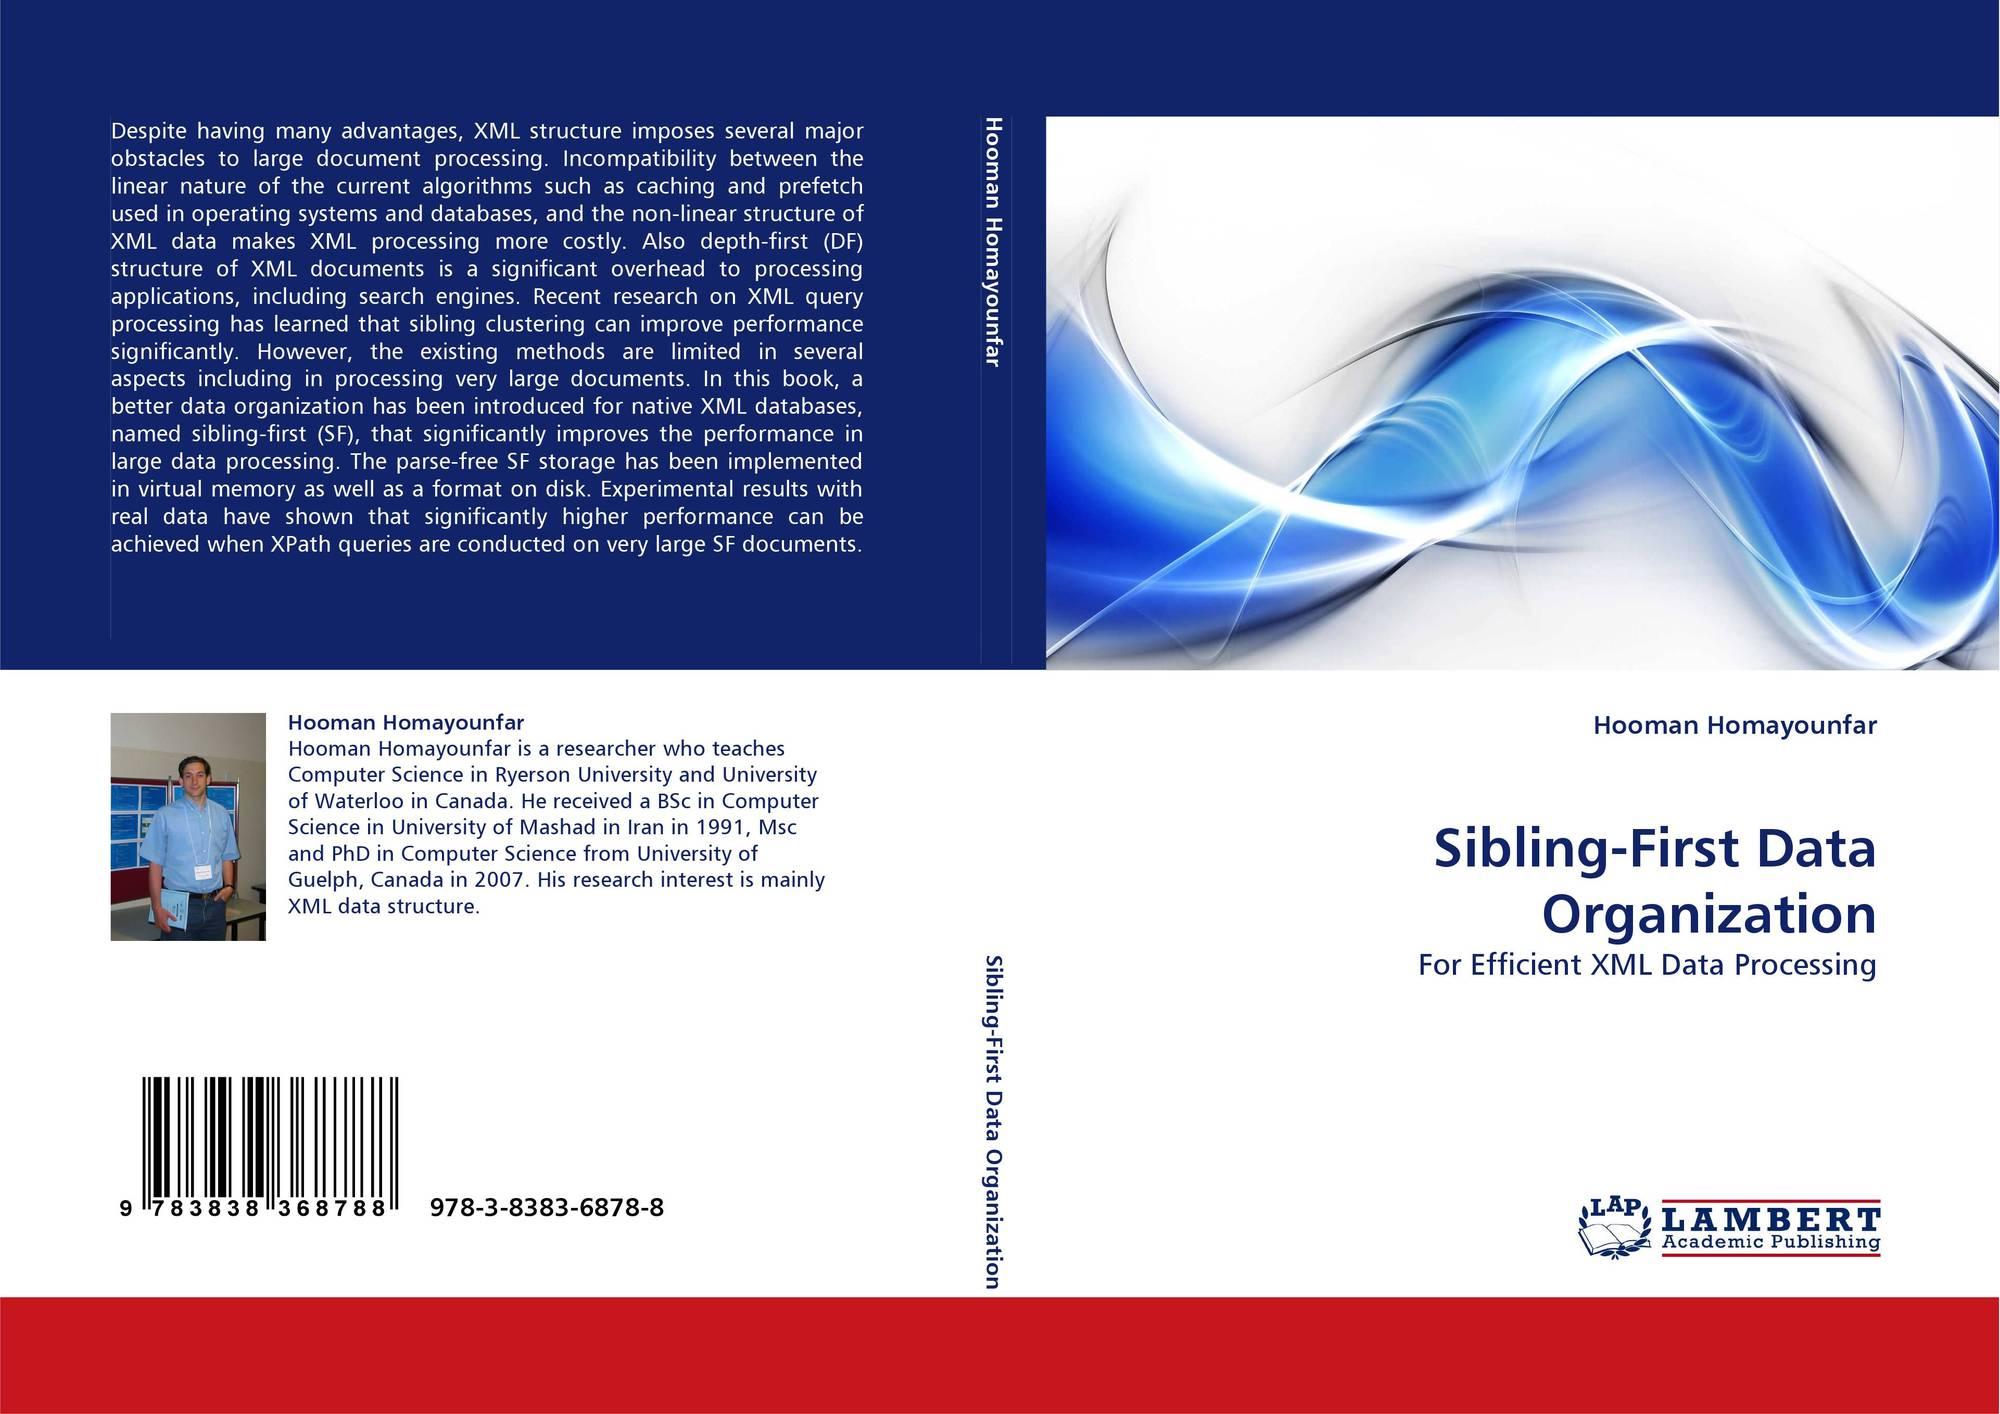 Sibling-First Data Organization, 978-3-8383-6878-8